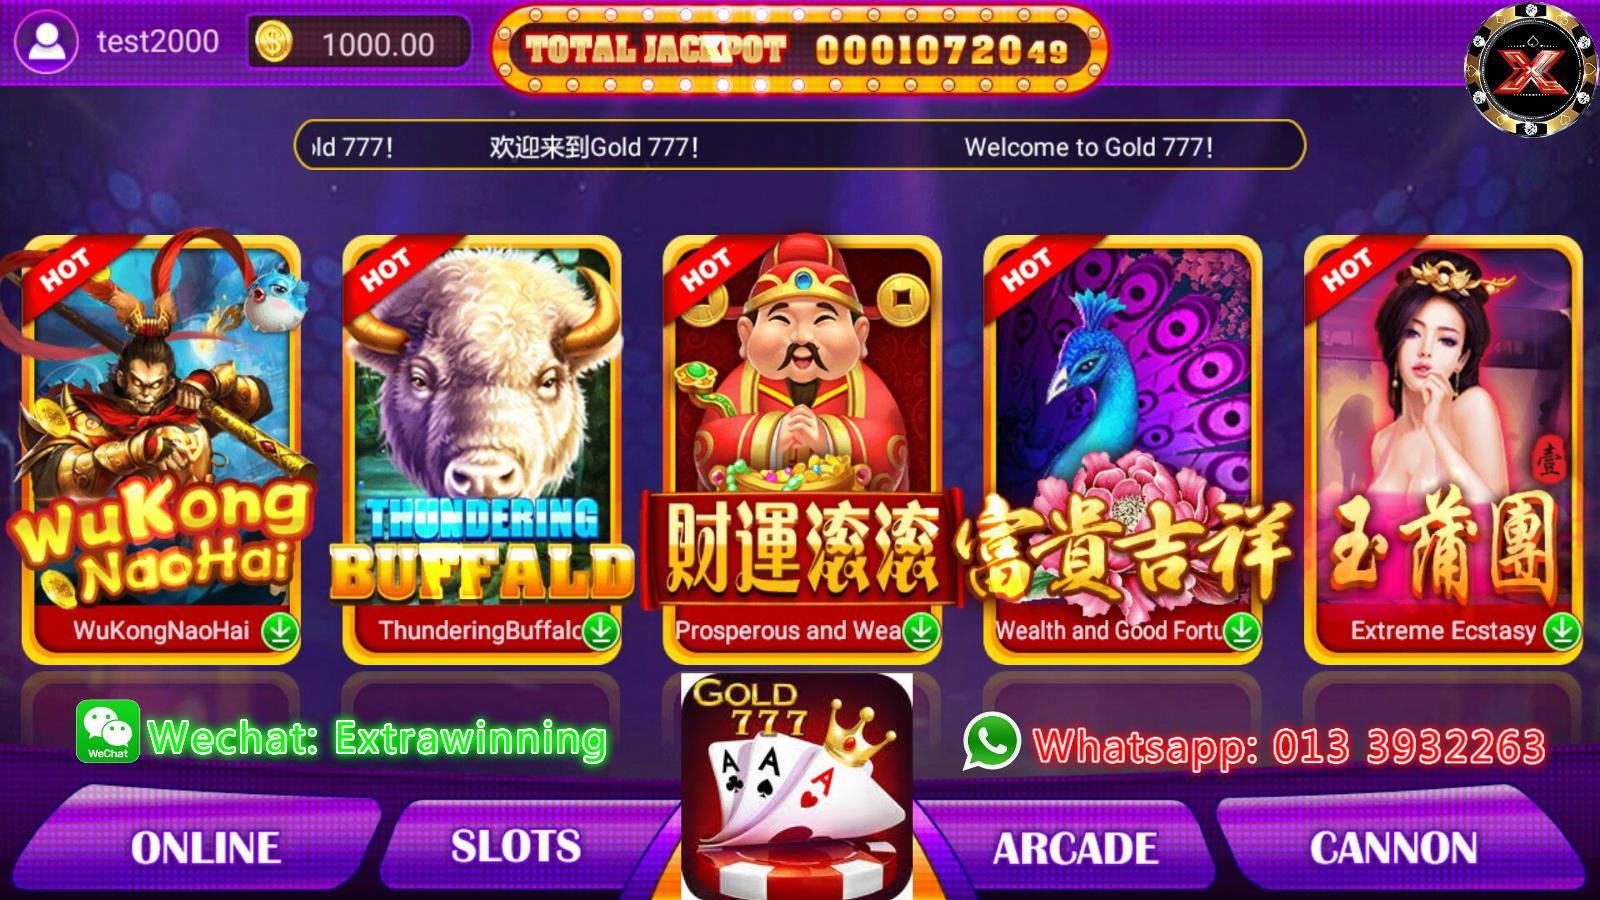 Casino Tips Emperorclubs Gold777 Live22 Mega888 Free Credit